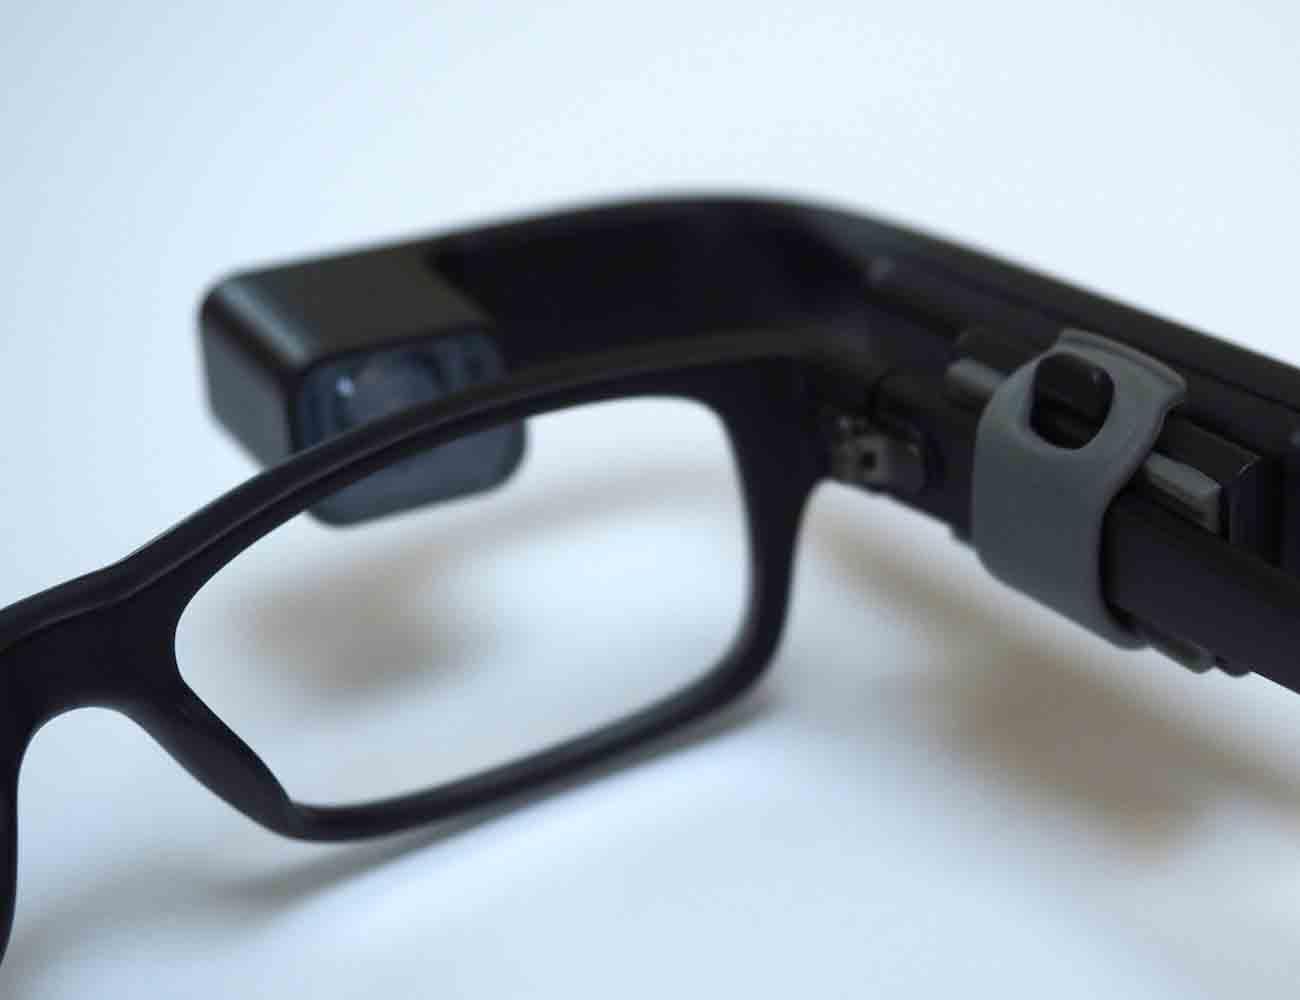 Vufine – A Handsfree Wearable Display